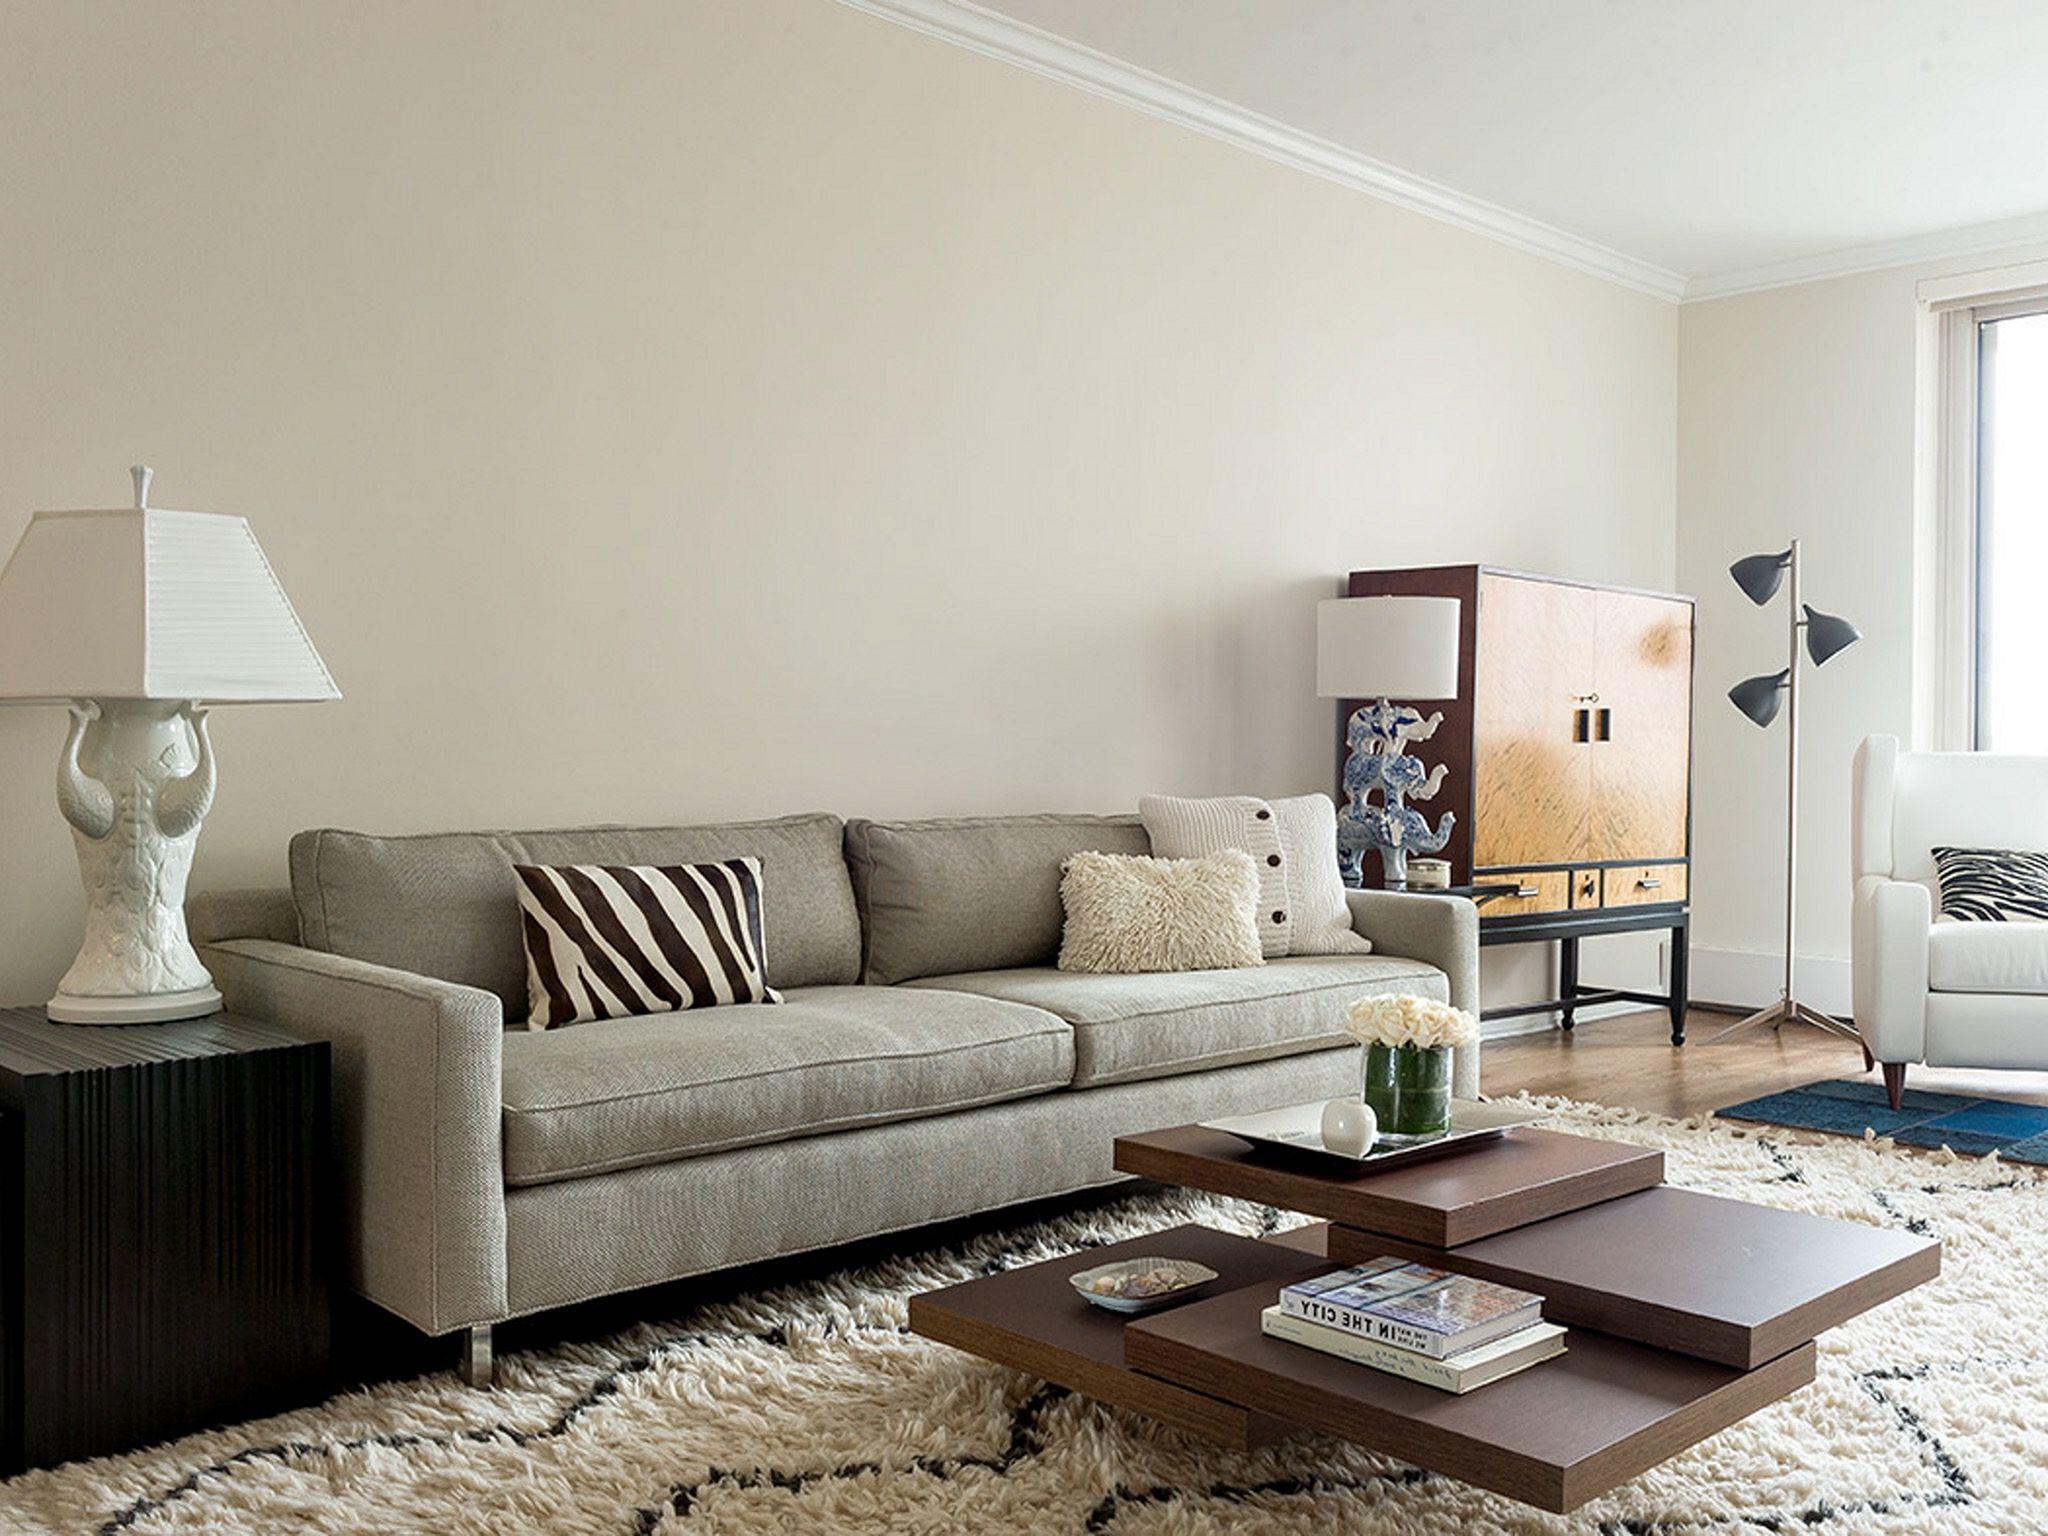 13 Stylish Living Room Interior With Rug Layering Ideas Living Room Decor Apartment Stylish Living Room Living Room Interior Living room ideas carpet